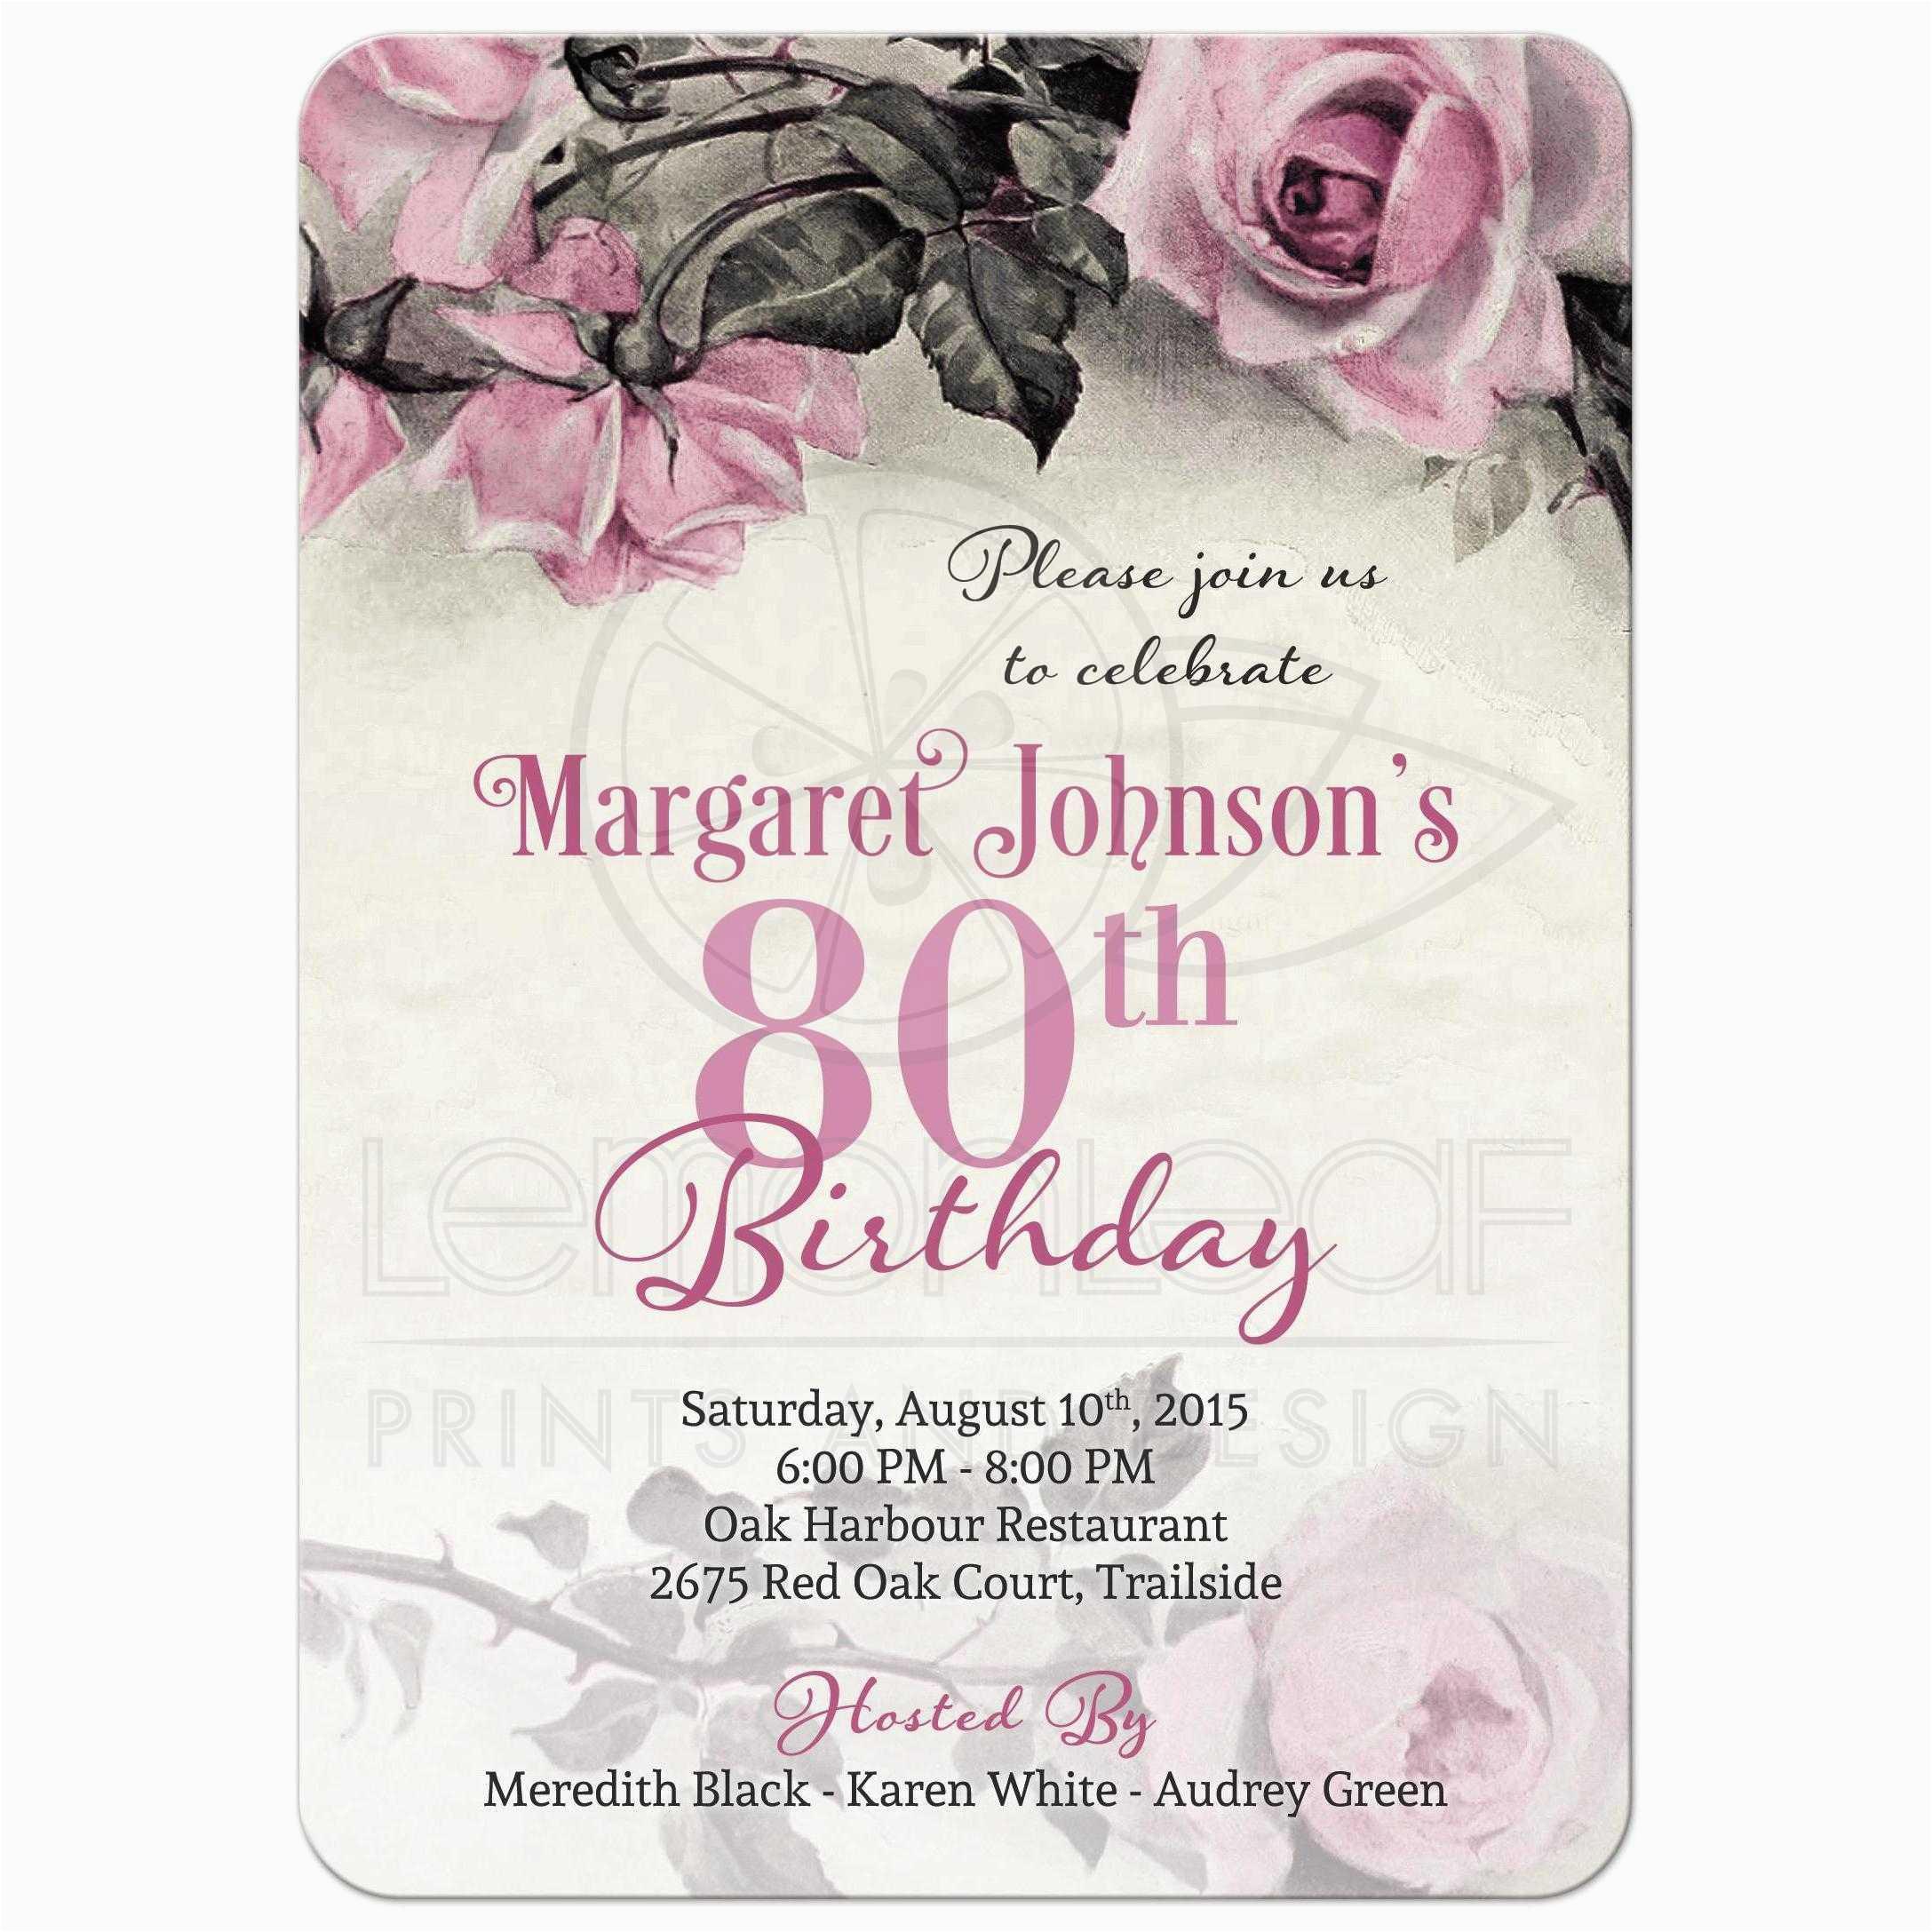 Free Printable 80th Birthday Invitations Templates 80th Birthday Party Invitations Party Invitations Templates